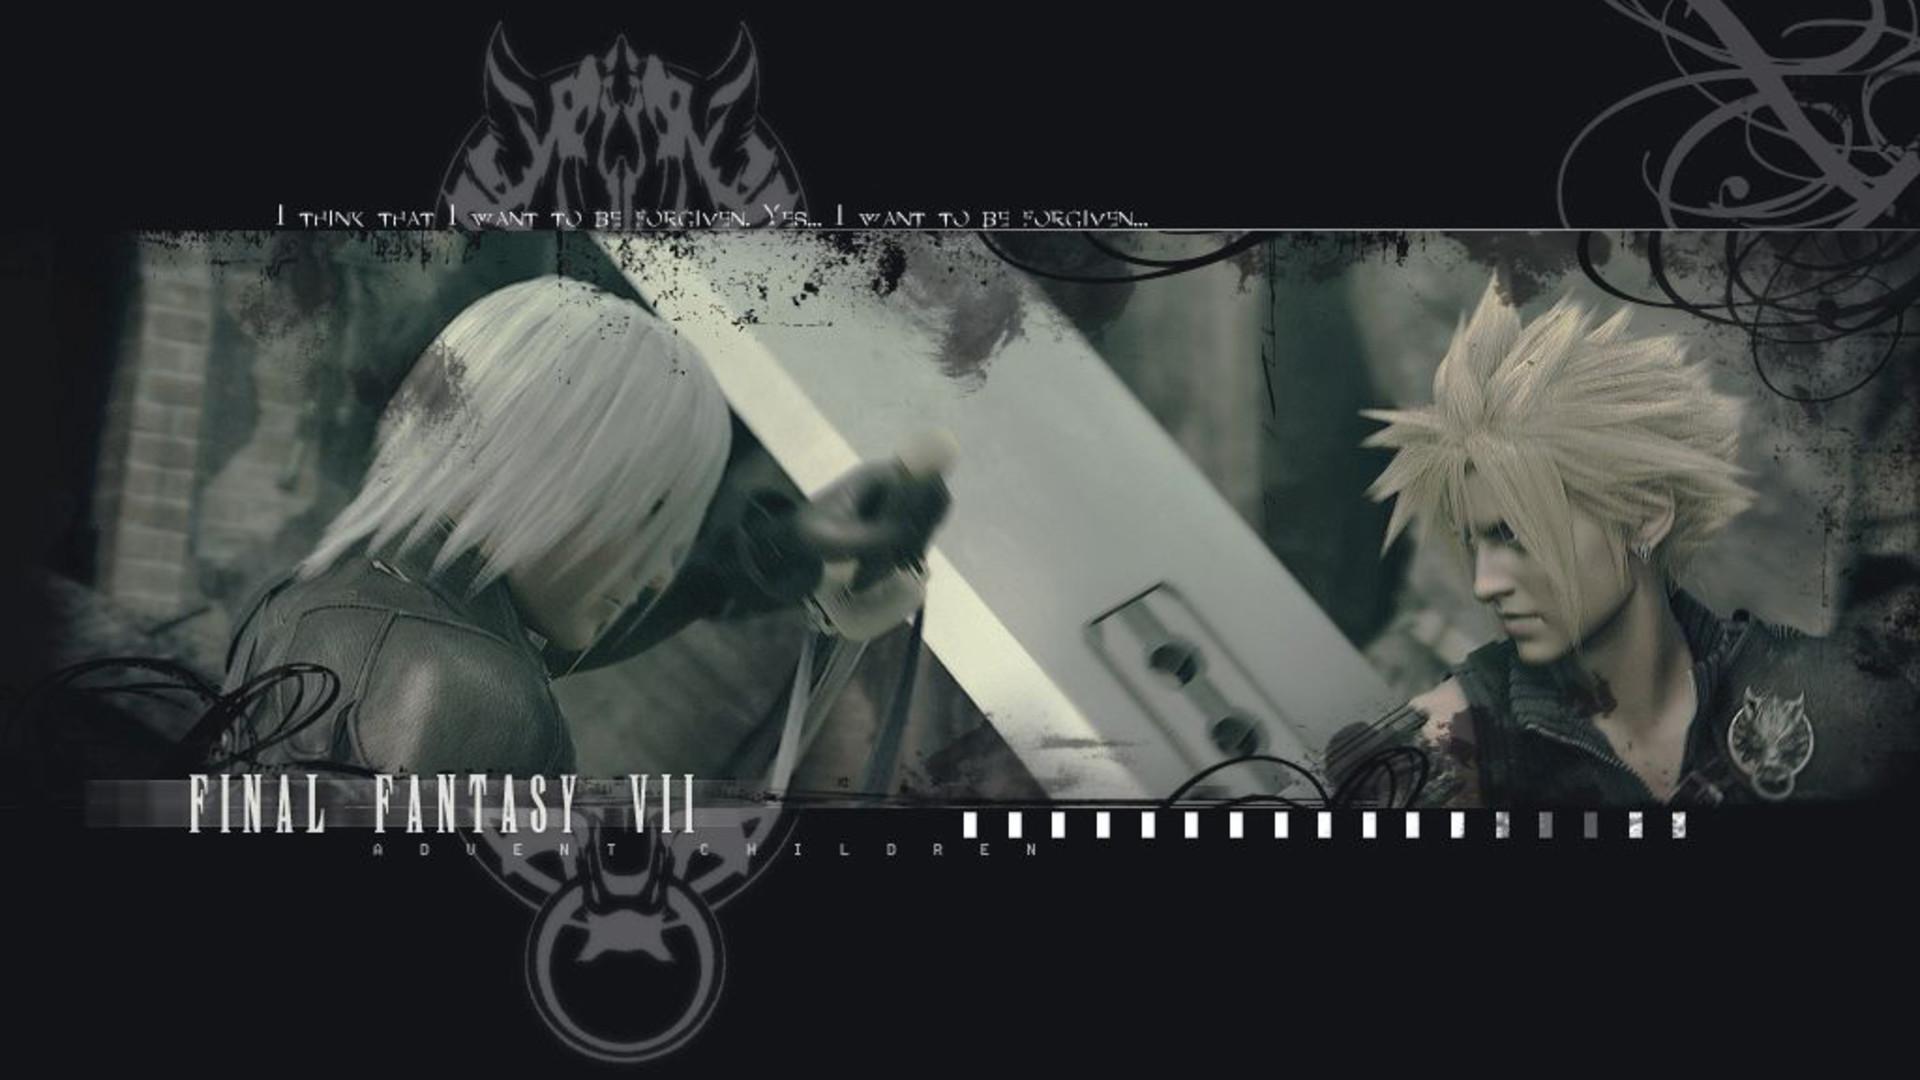 Final Fantasy 1 Wallpaper HD #4592